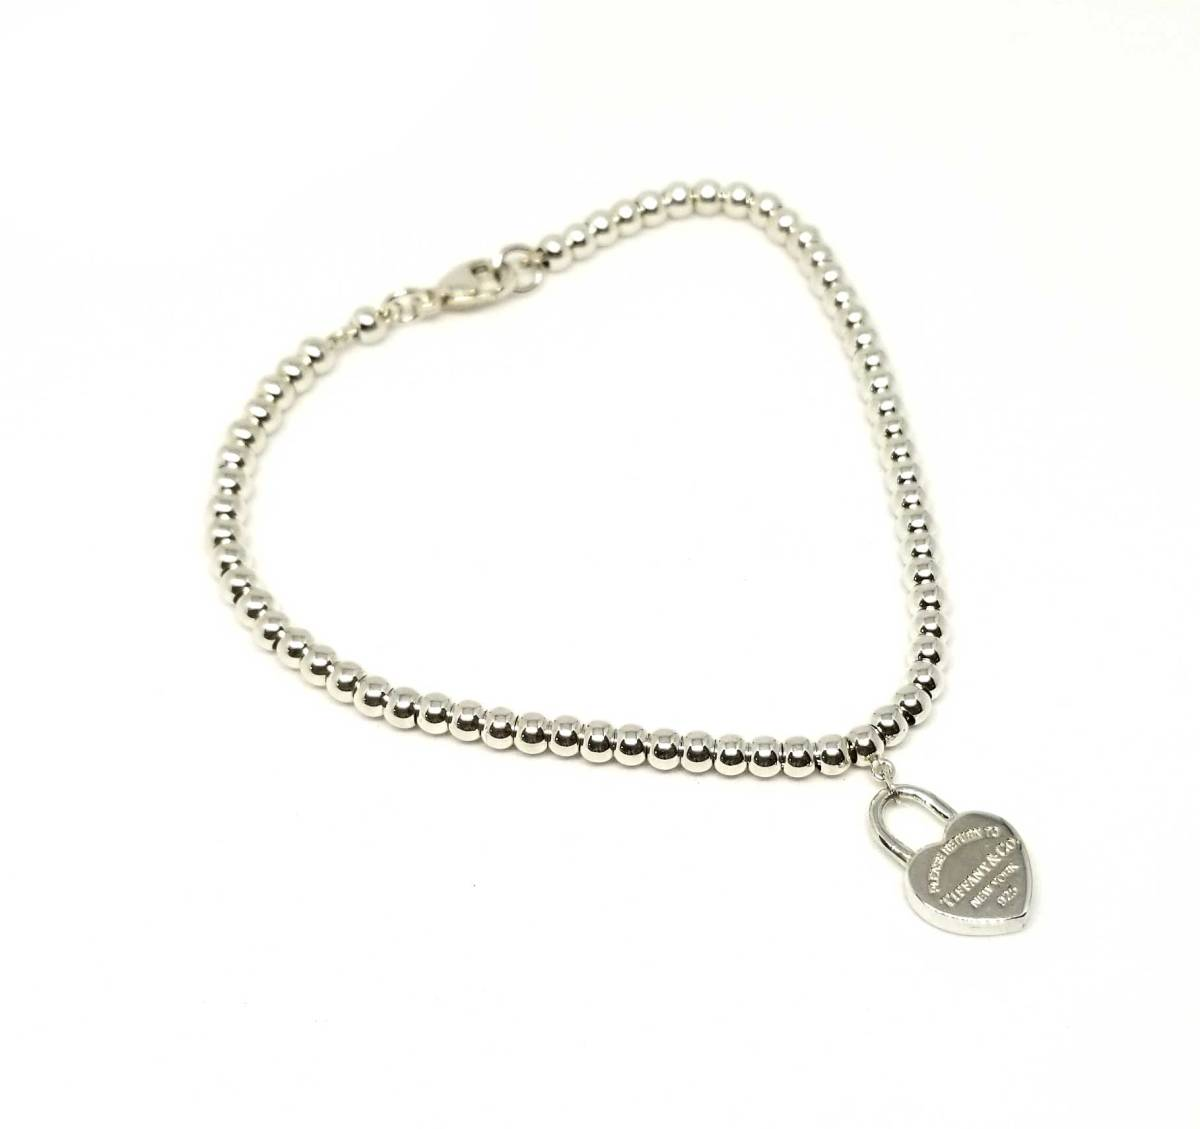 03c436738 Tiffany return toe Tiffany heart beads bracelet heart tag Lady's silver  SV925 silver 925 accessories beauty ...